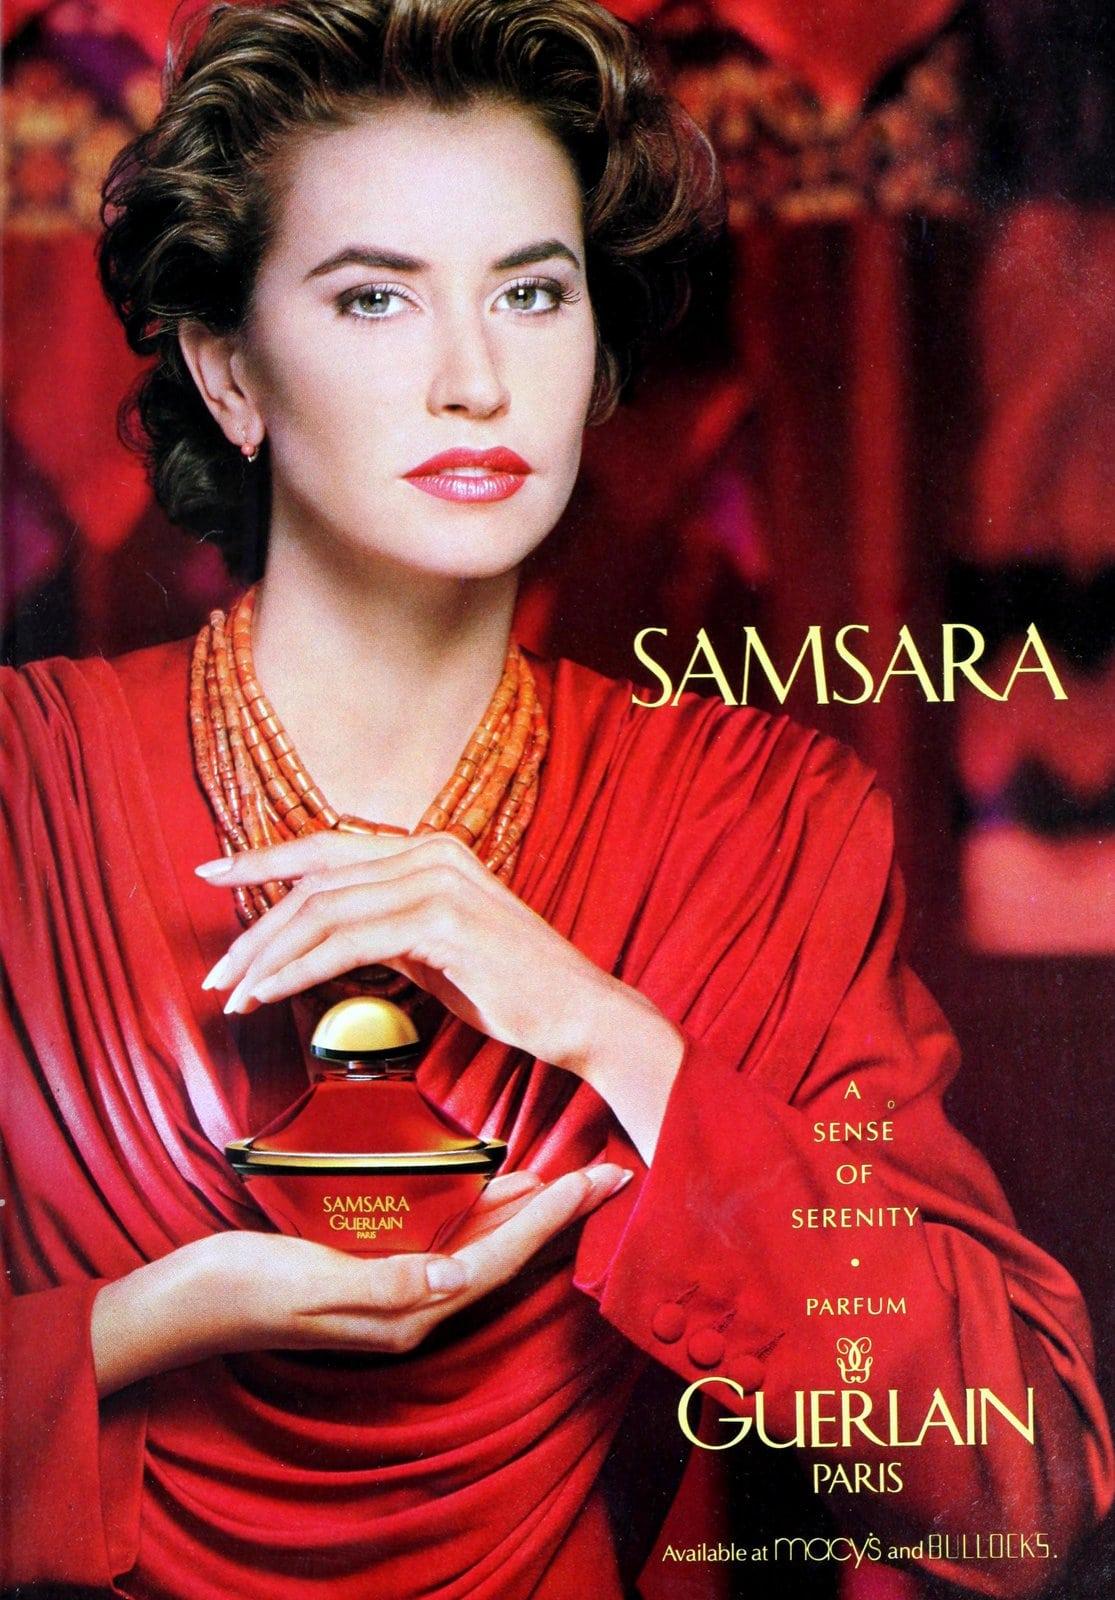 Samsara parfum from Guerlain Paris (1992) at ClickAmericana.com